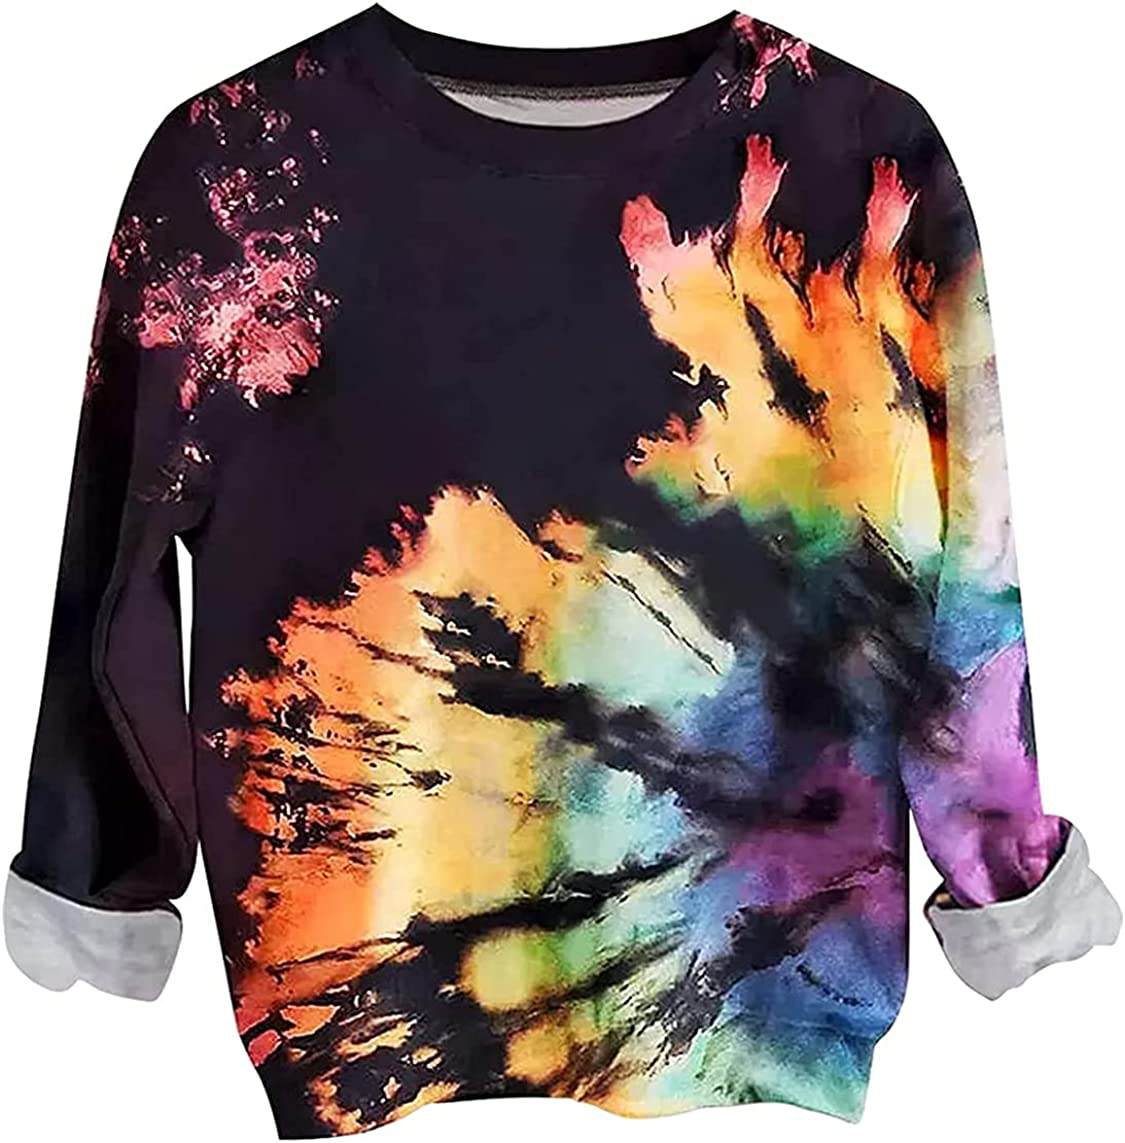 Reverse Tie Dye Sweatshirt for Women Fall Winter Long Sleeve Lightweight Pullover Sweatshirt Casual Crewneck Top Shirts